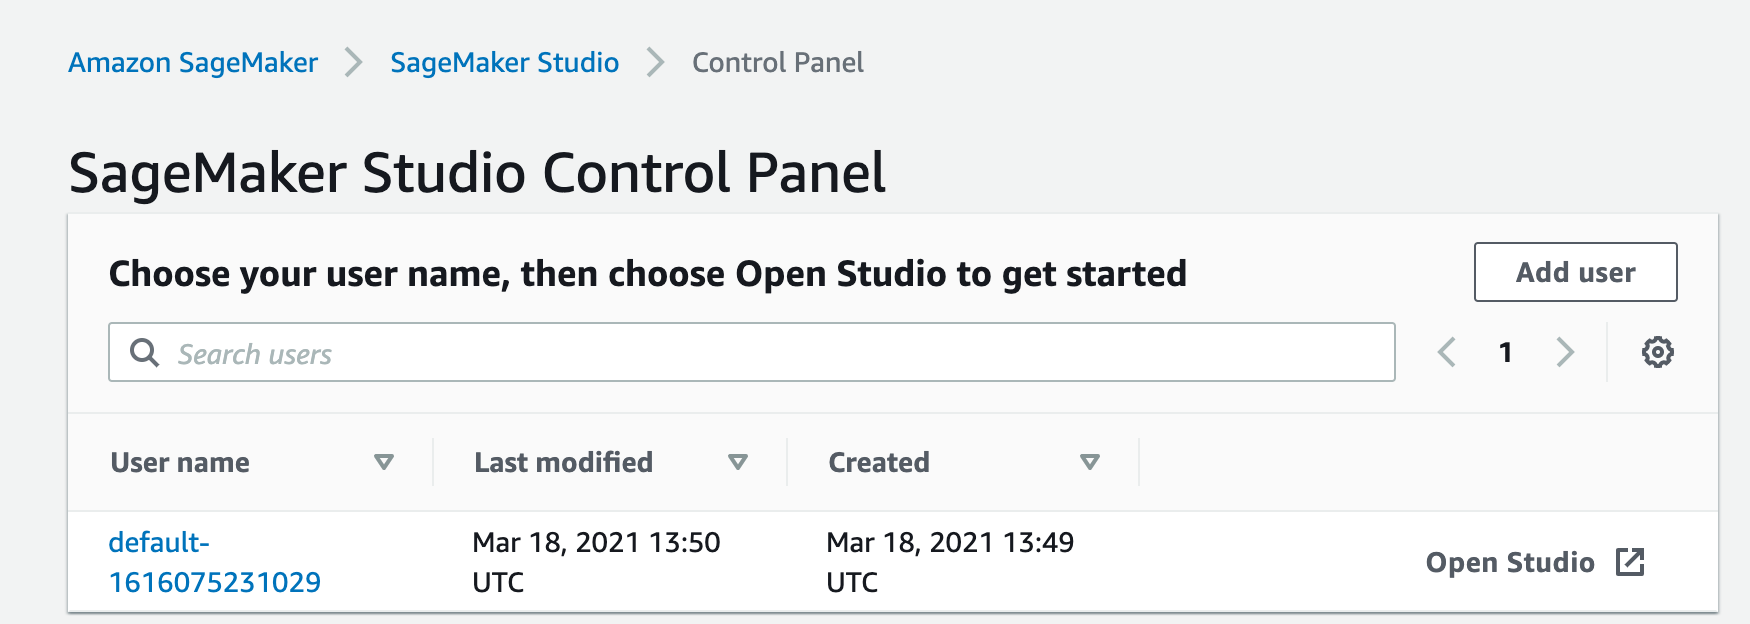 SageMaker control panel